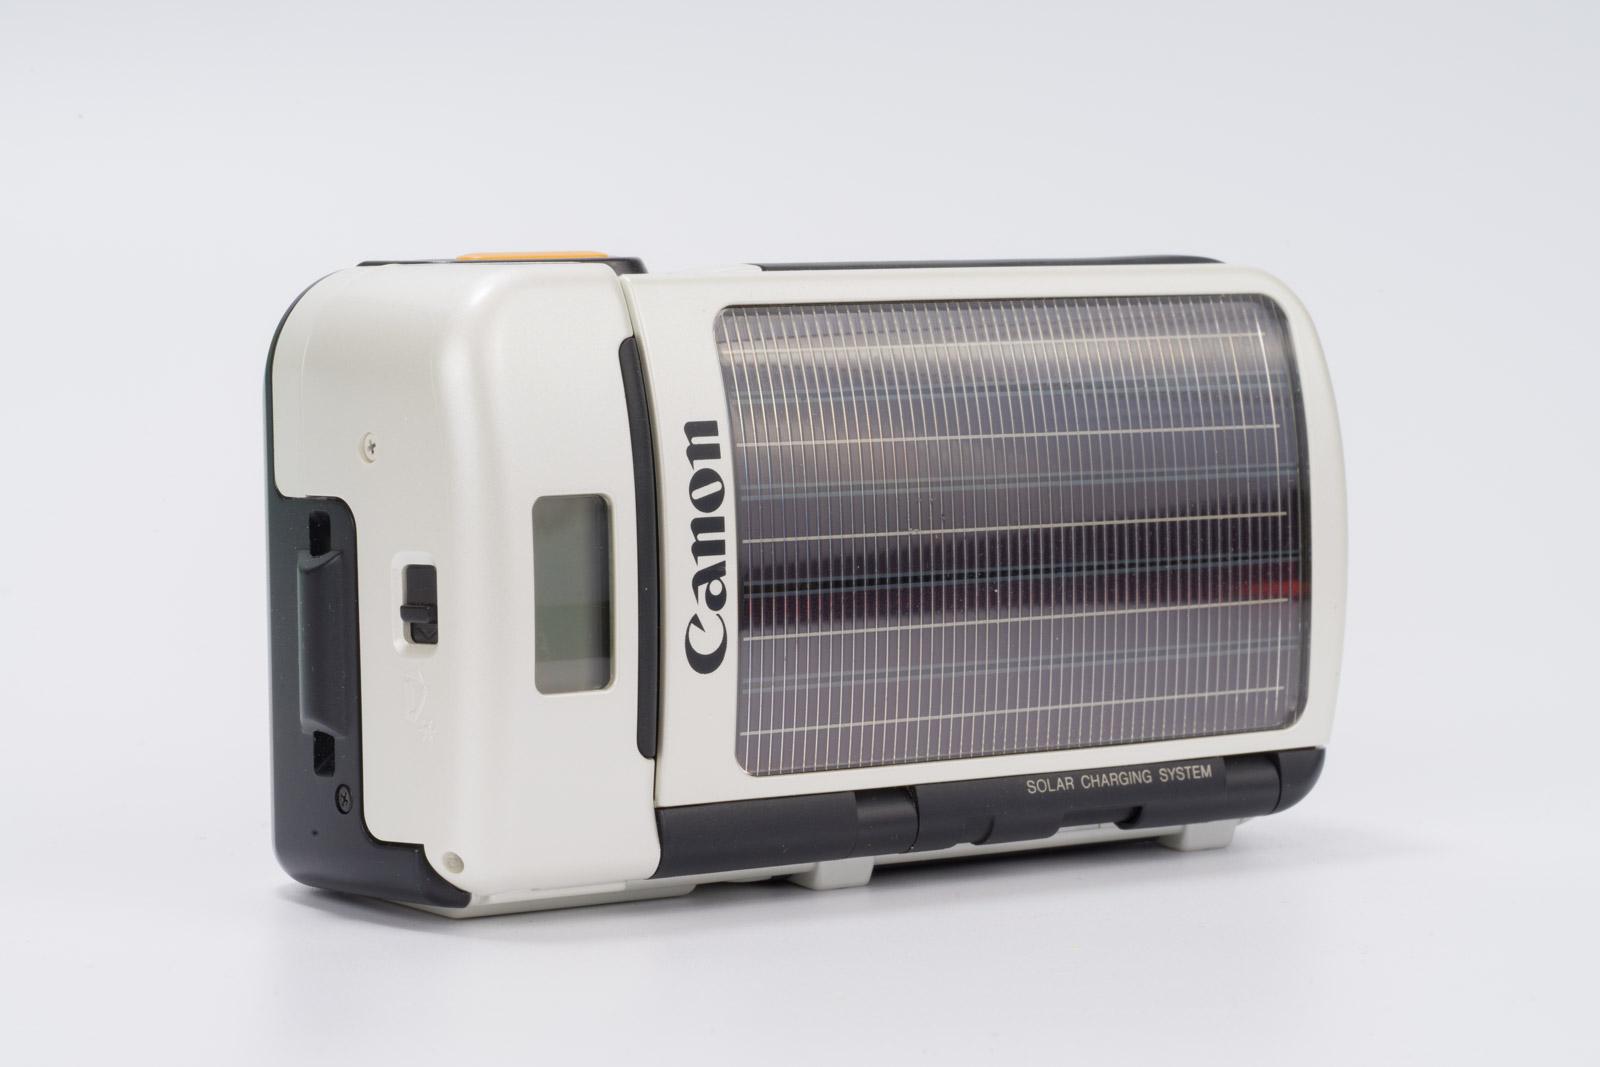 canon sure shot del sol solar camera